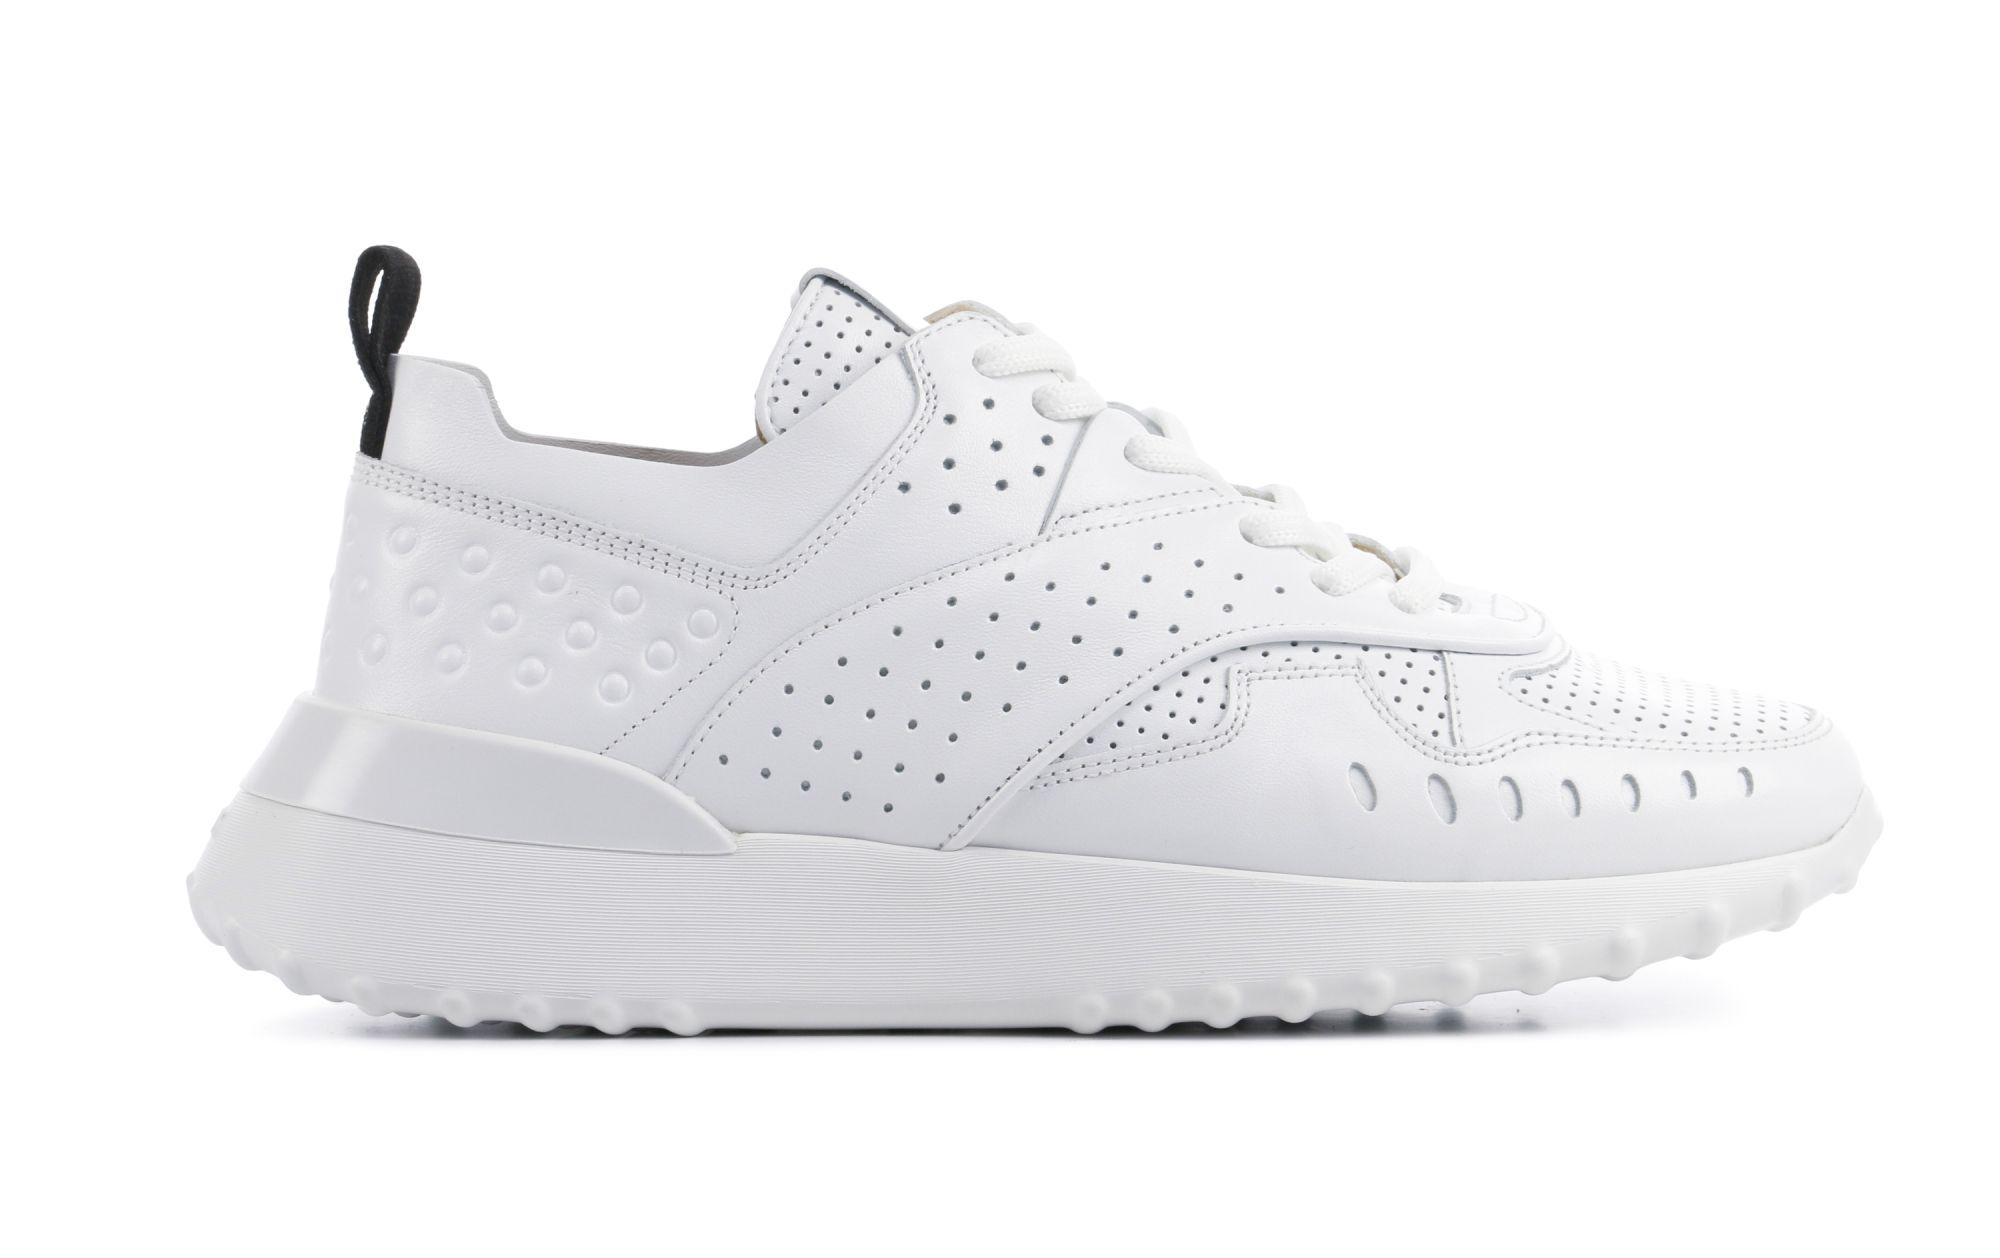 Sneakers Dames (Wit) Daling Van De Scheepvaart Gmaou3O